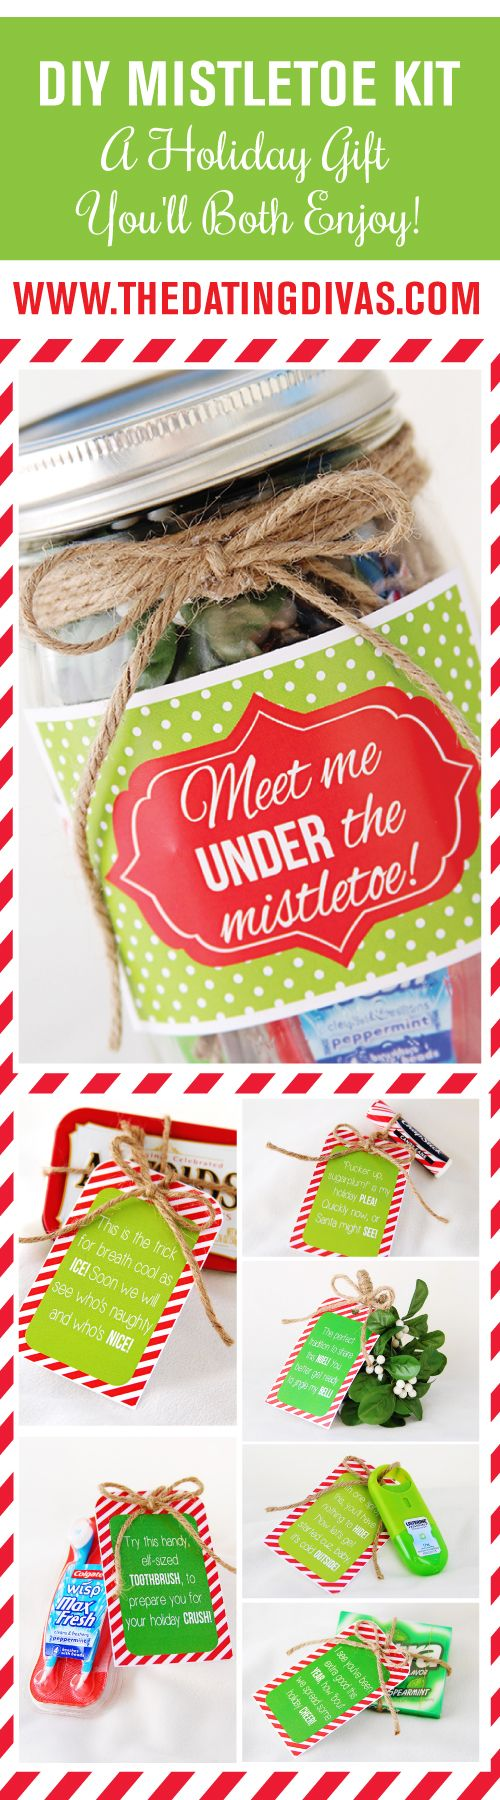 Adorable DIY Mistletoe Kit! Free download.